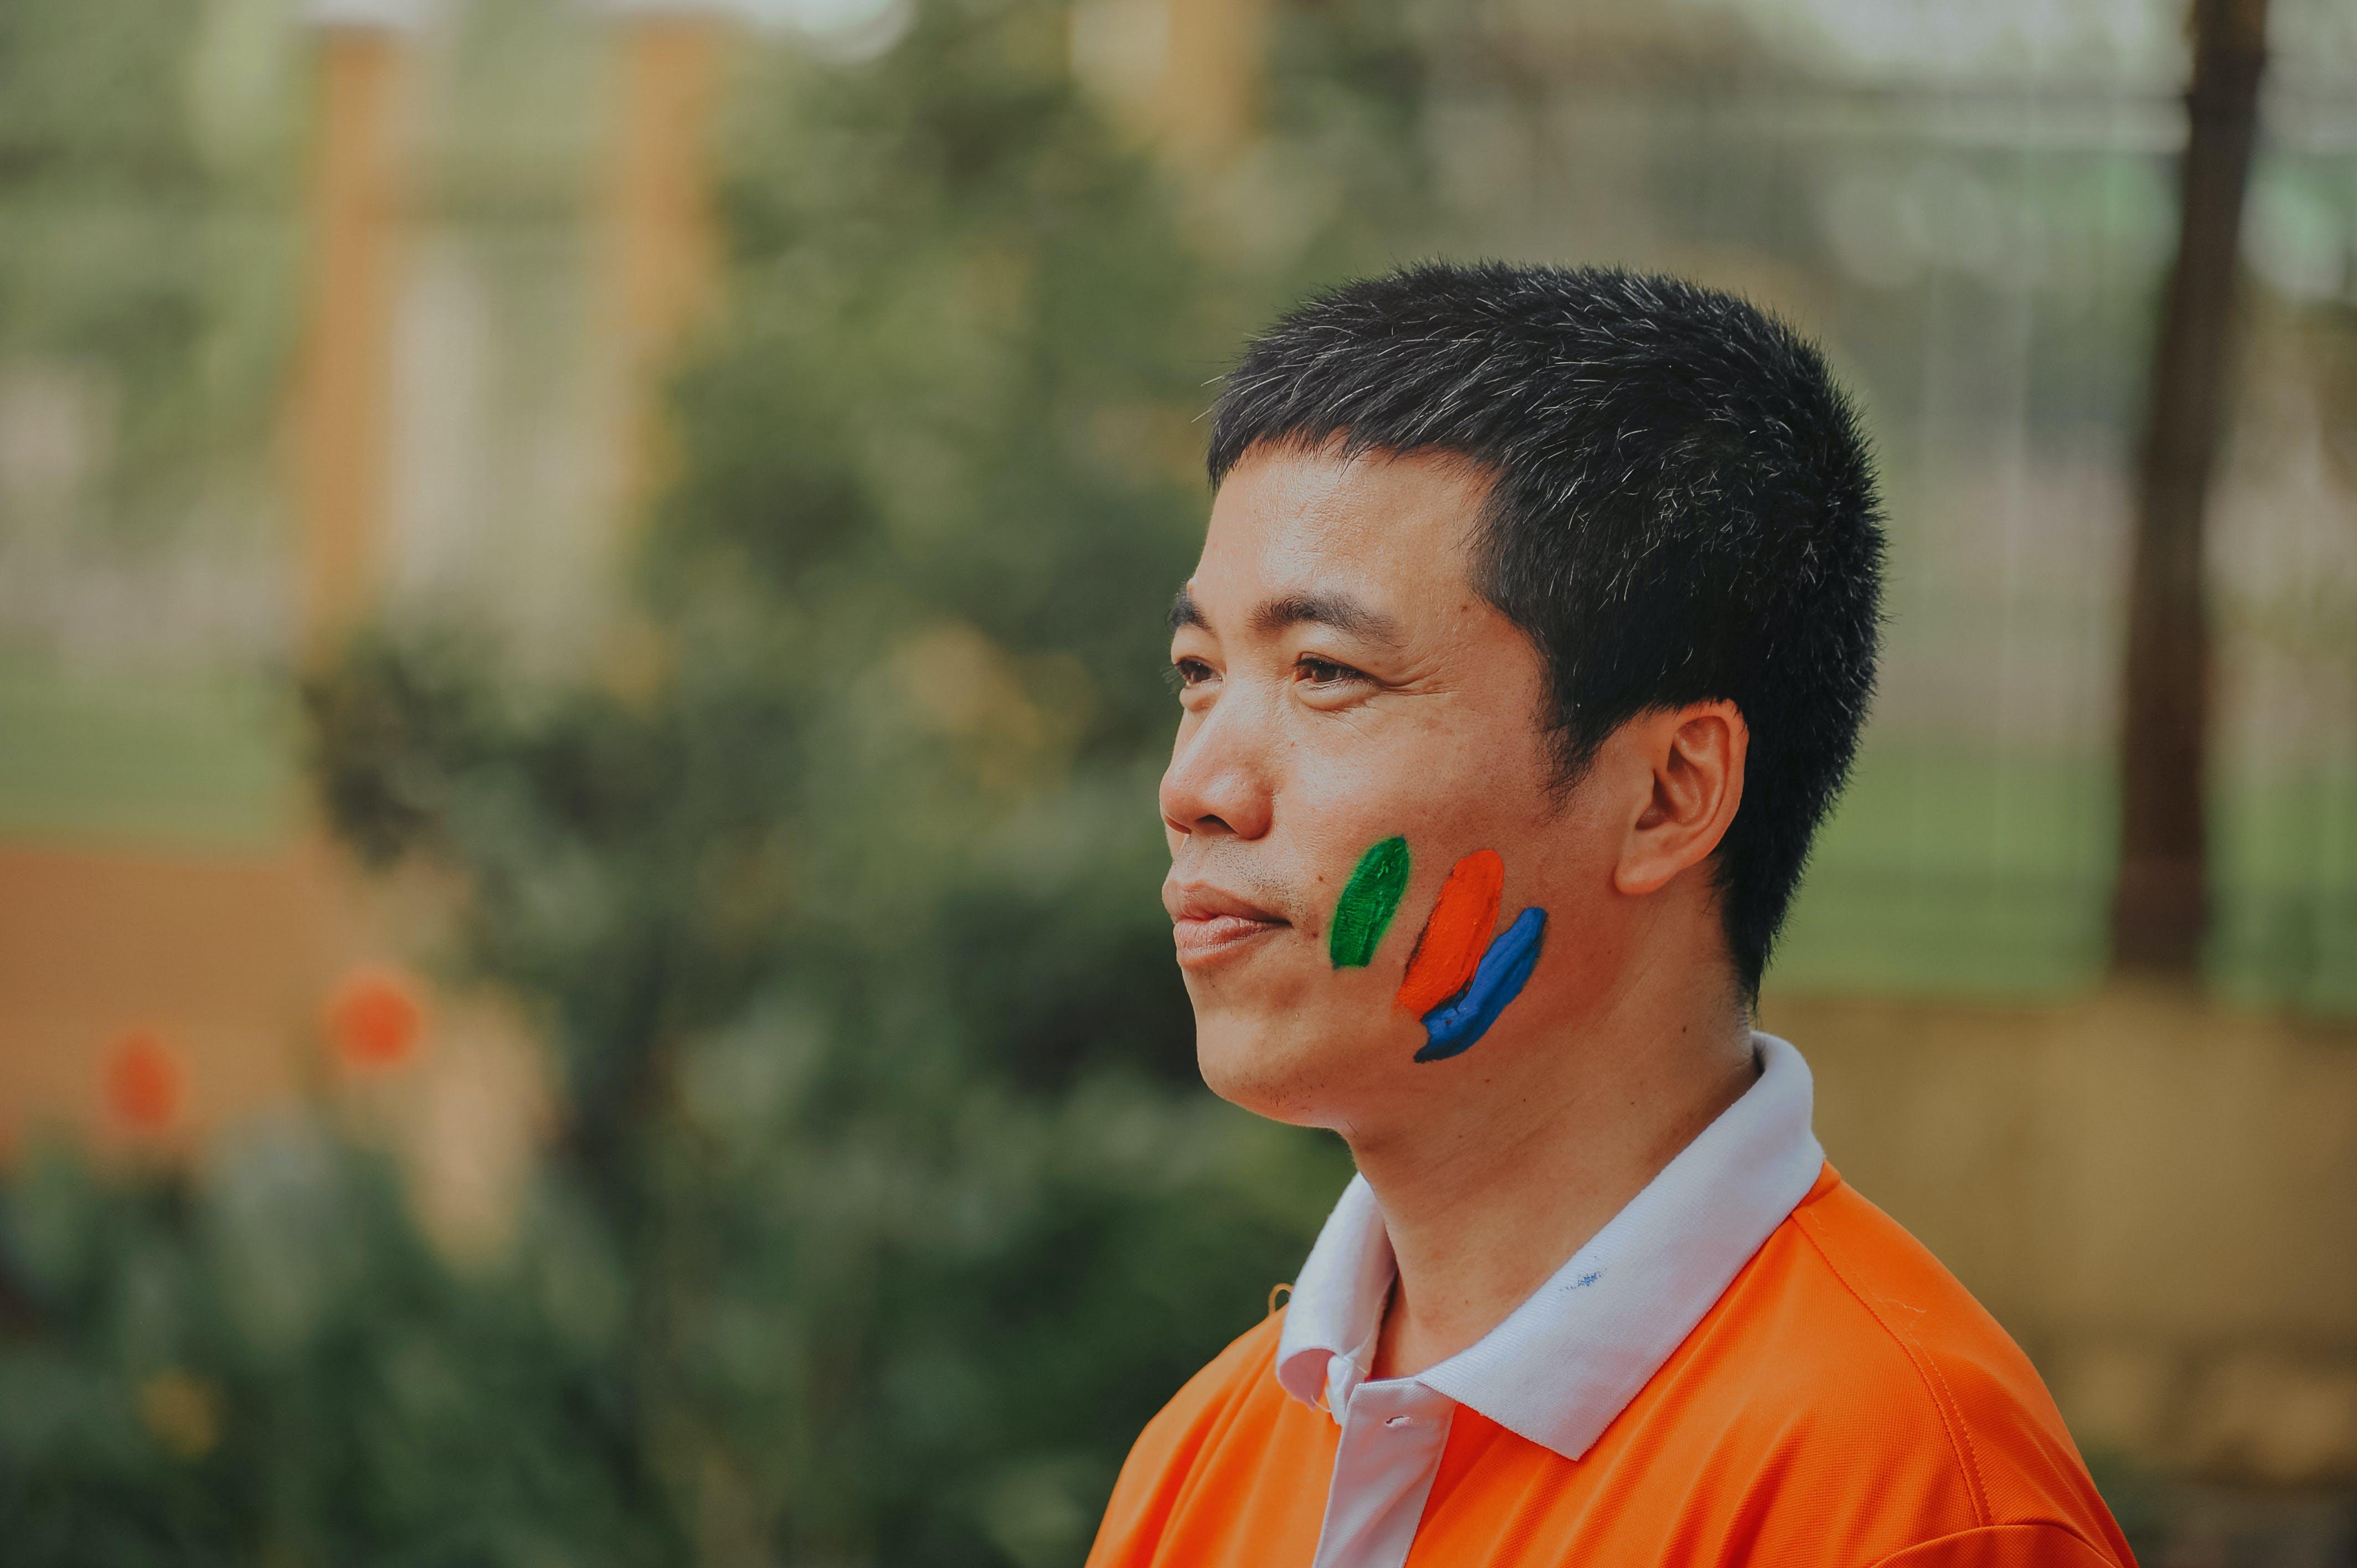 Man Wearing White and Orange Polo Shirt